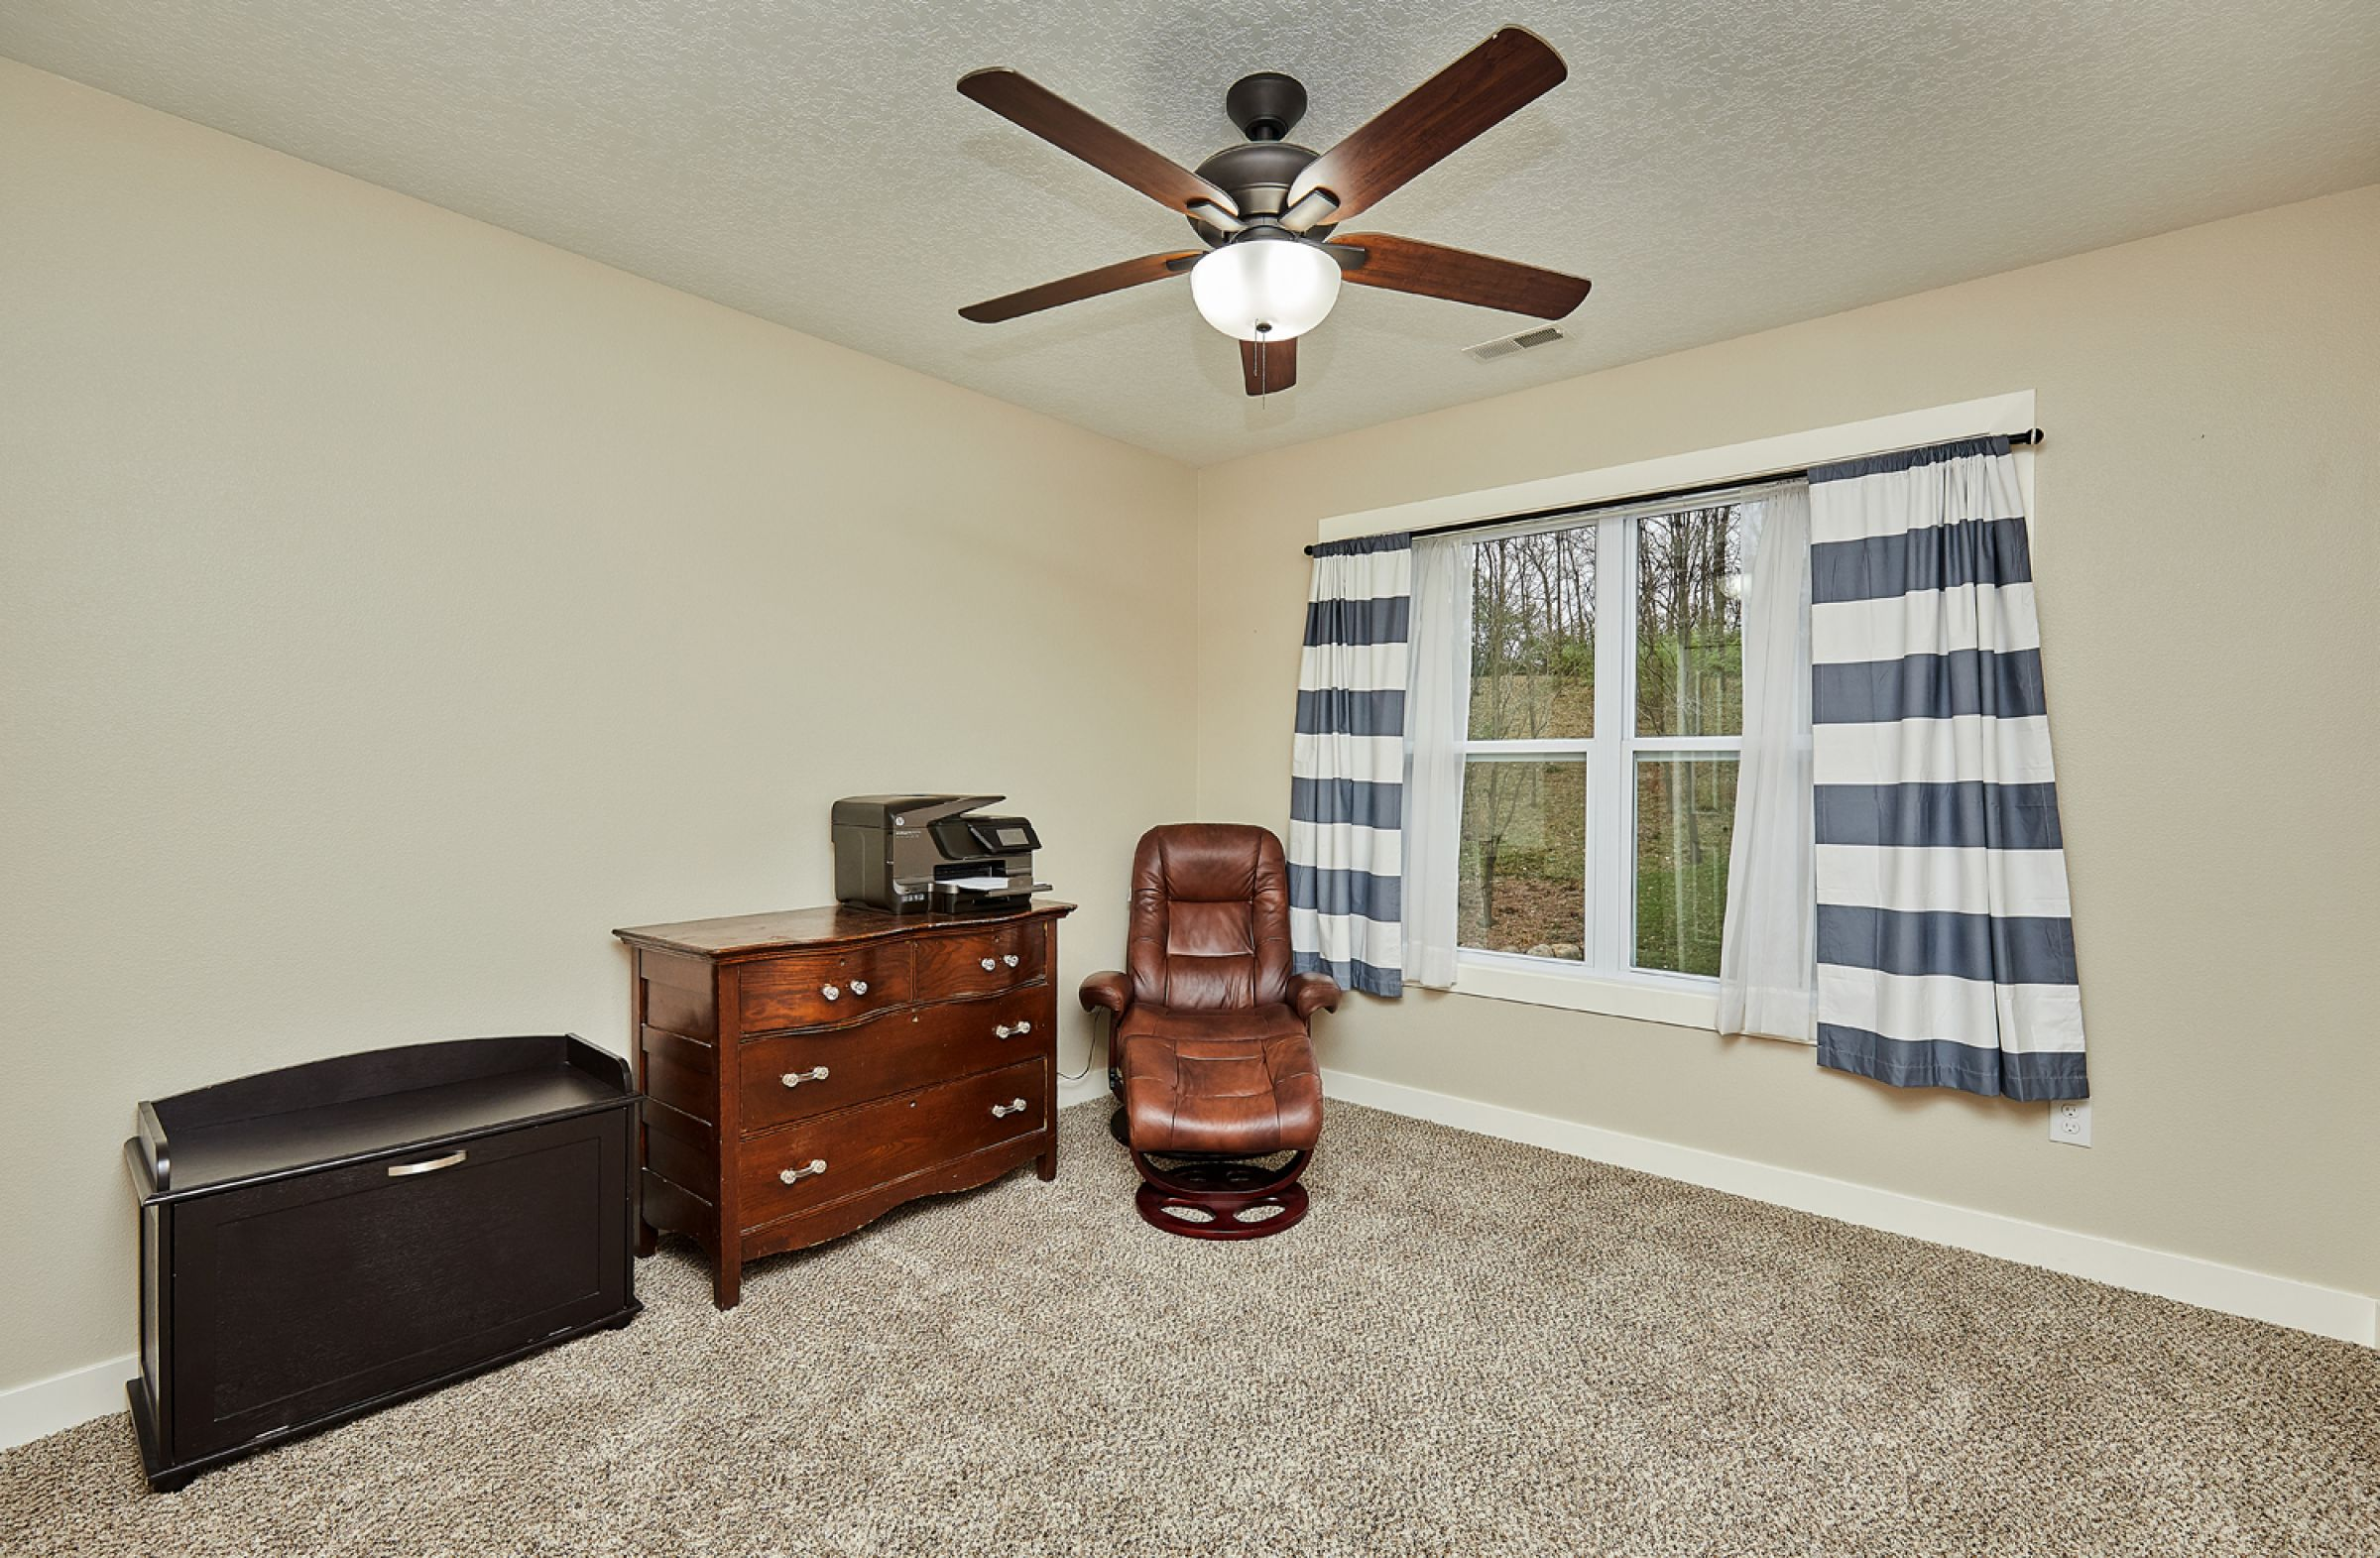 residential-warren-county-iowa-1-acres-listing-number-15254-9-2020-11-11-184122.jpg